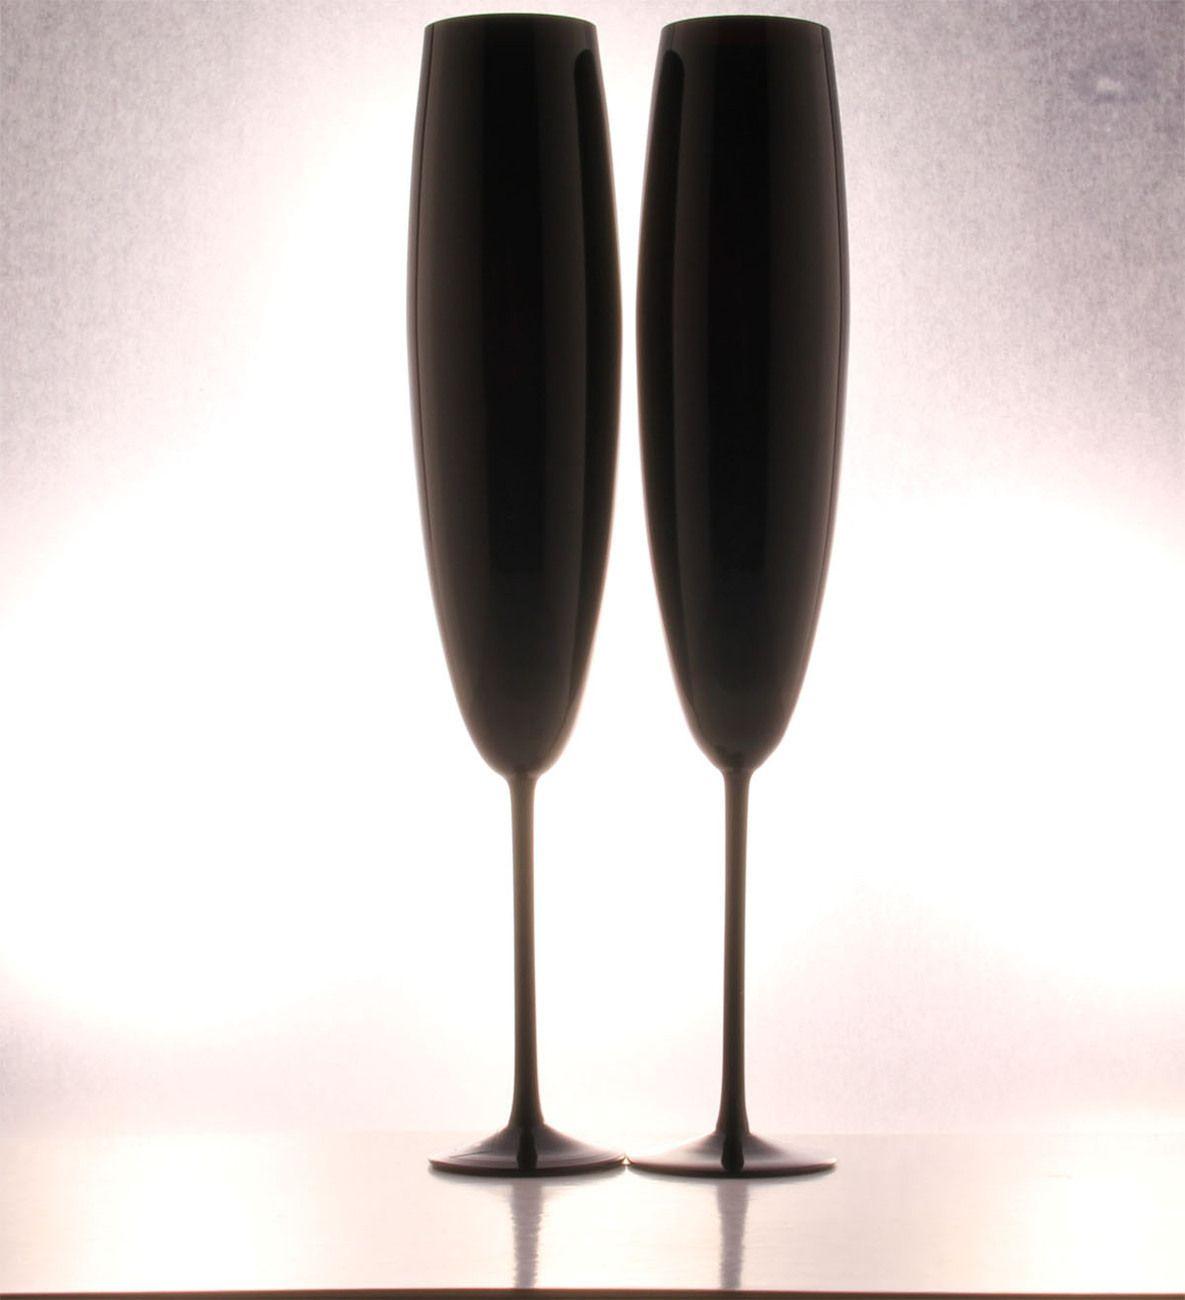 Midnight Black Champagne Flutes, Handmade (Set of 2)